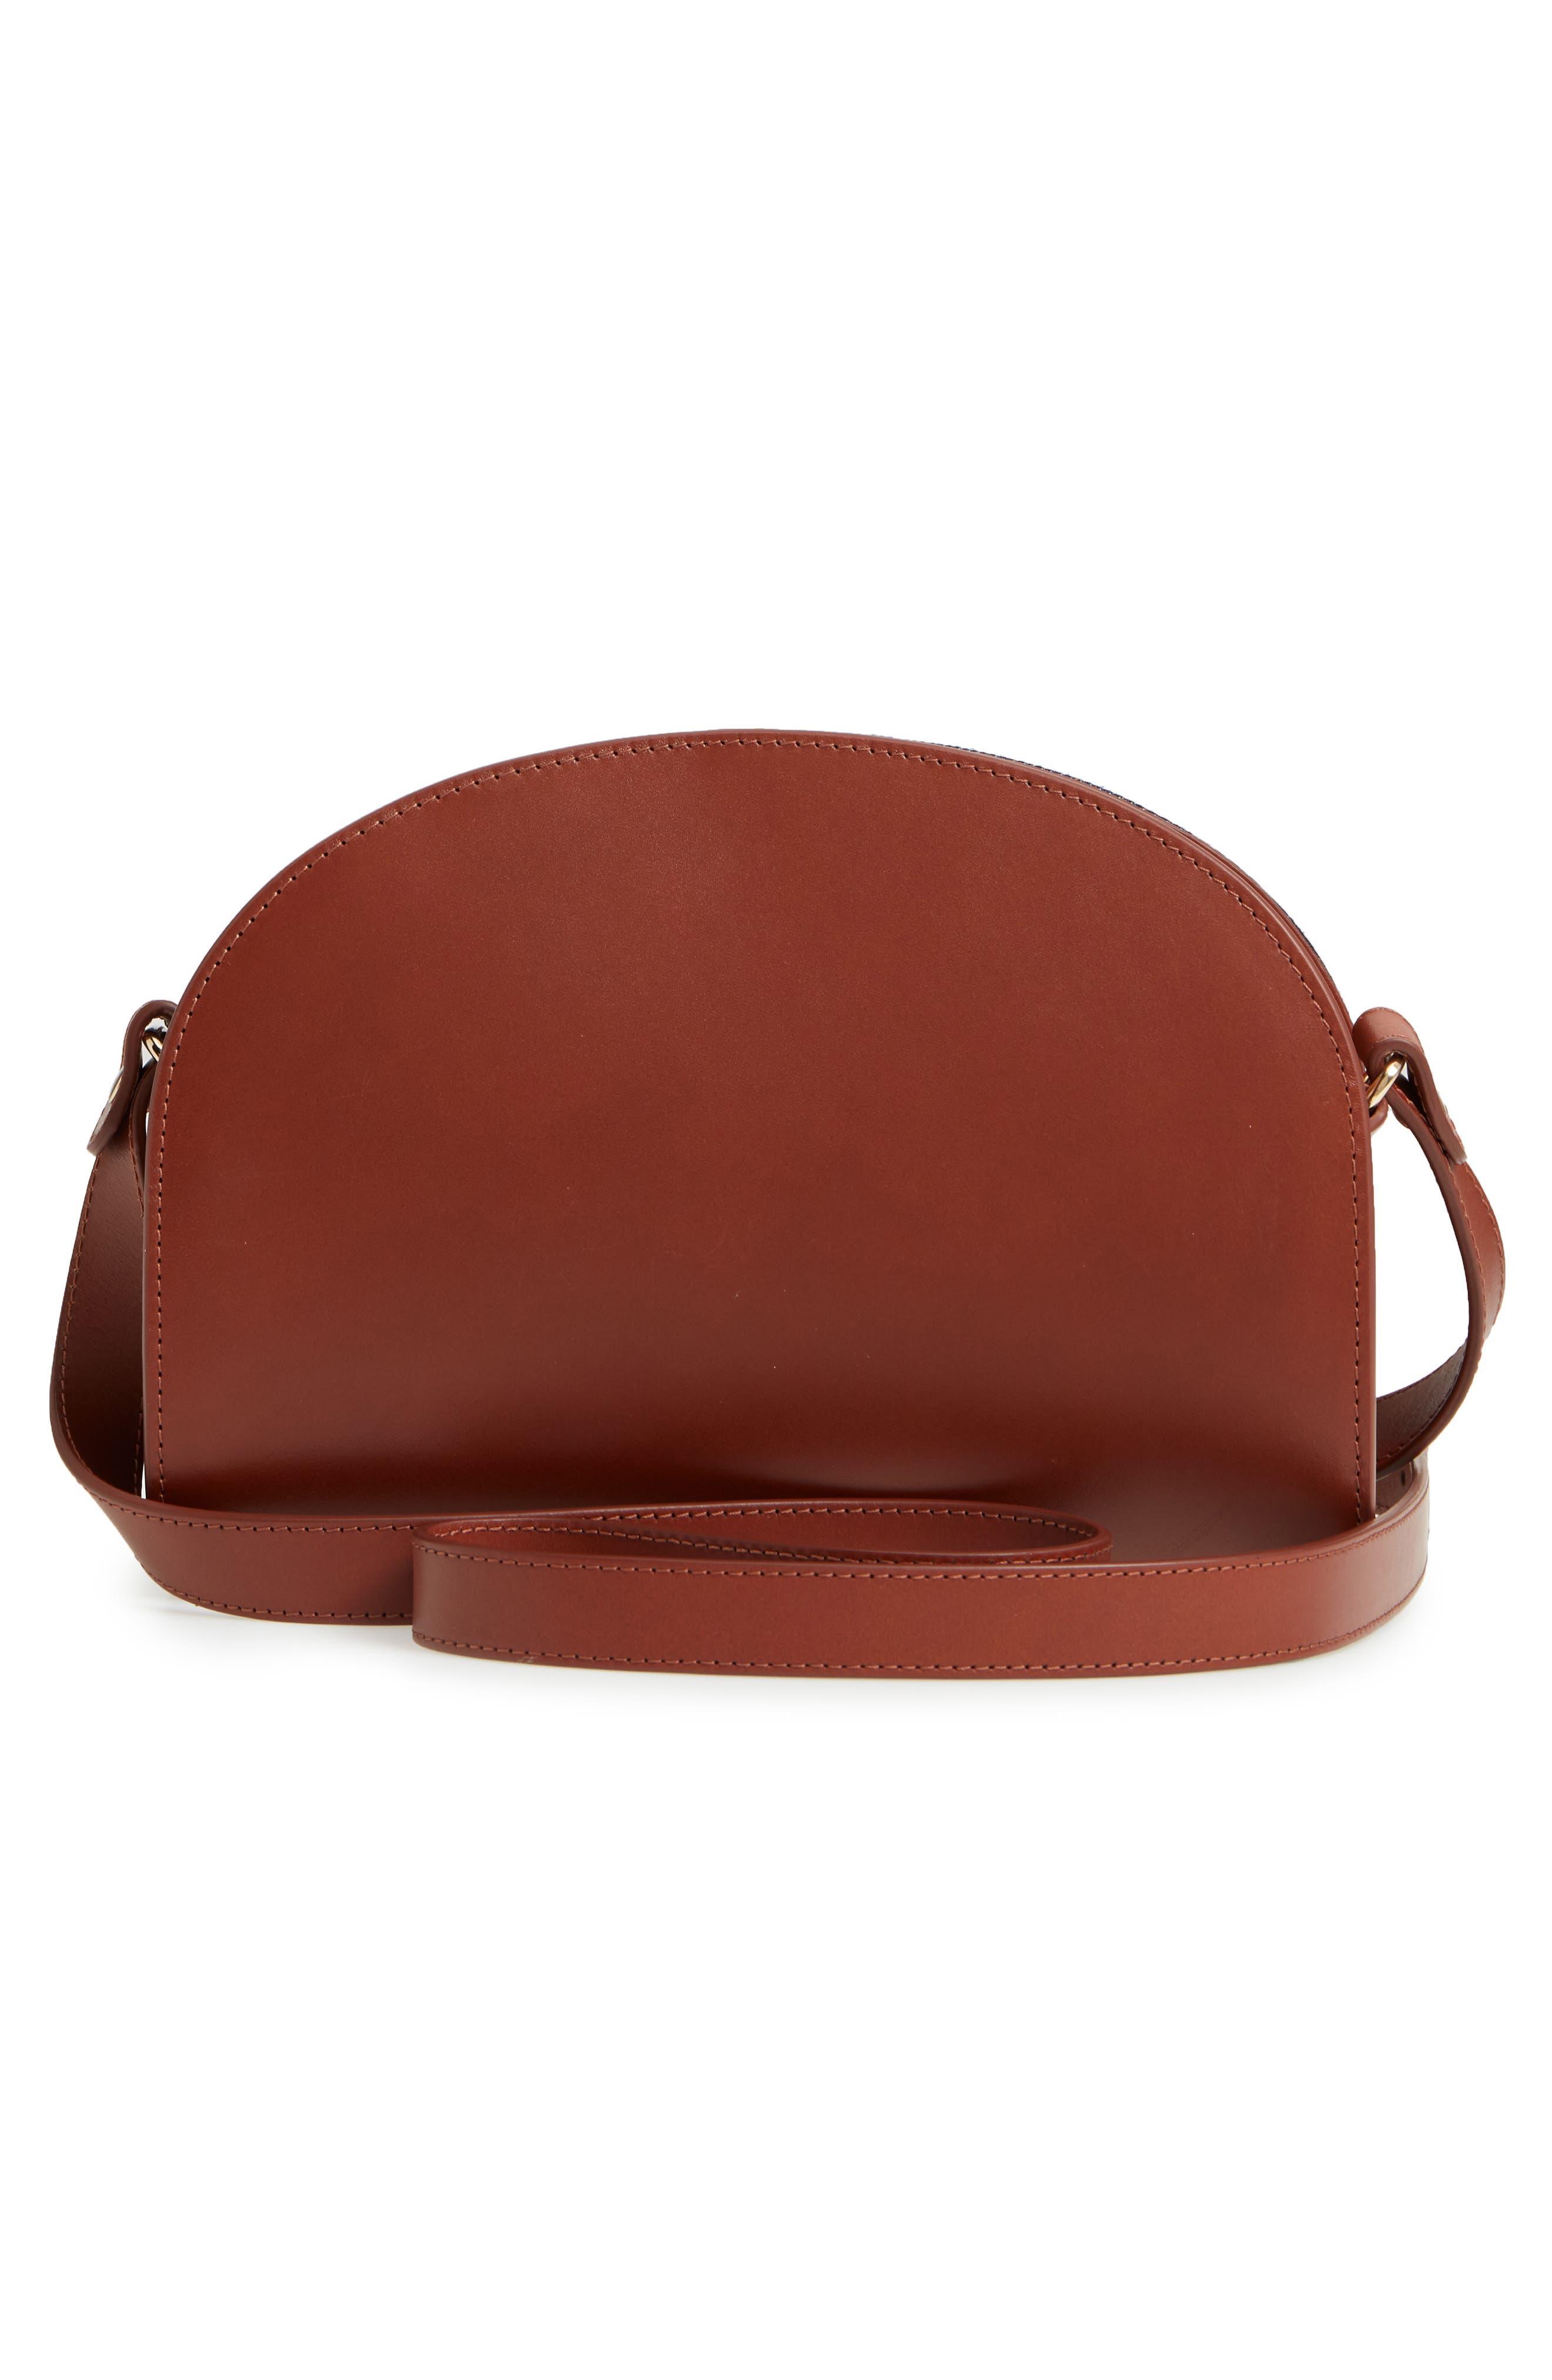 A.P.C., Sac Demilune Leather & Denim Crossbody Bag, Alternate thumbnail 3, color, 242